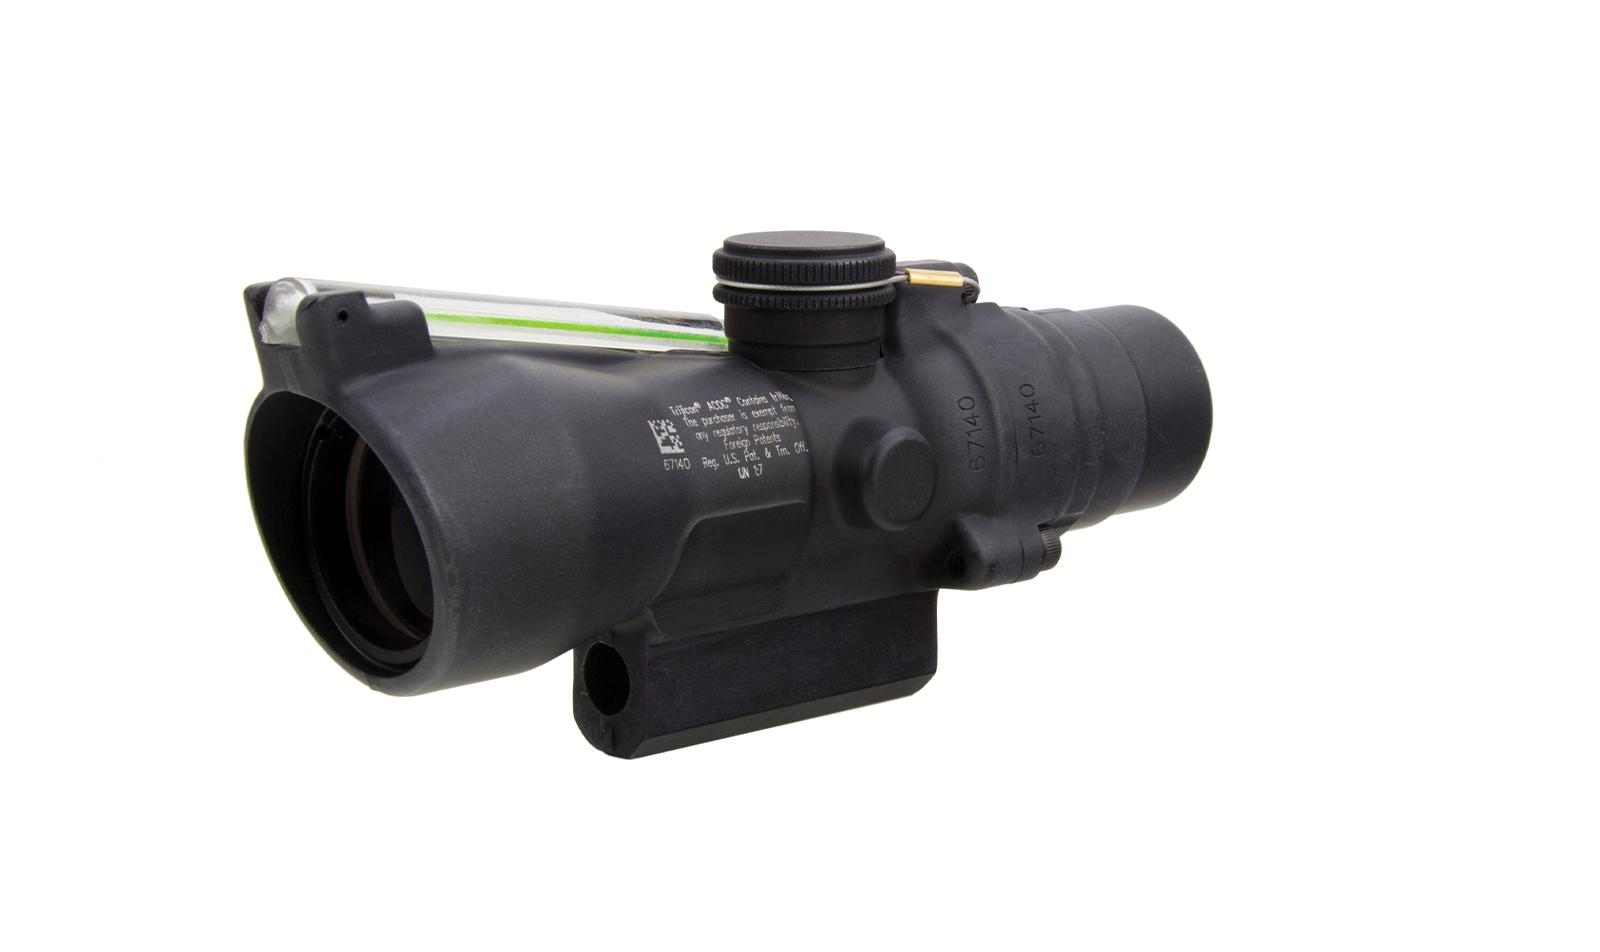 TA50-C-400145 angle 1